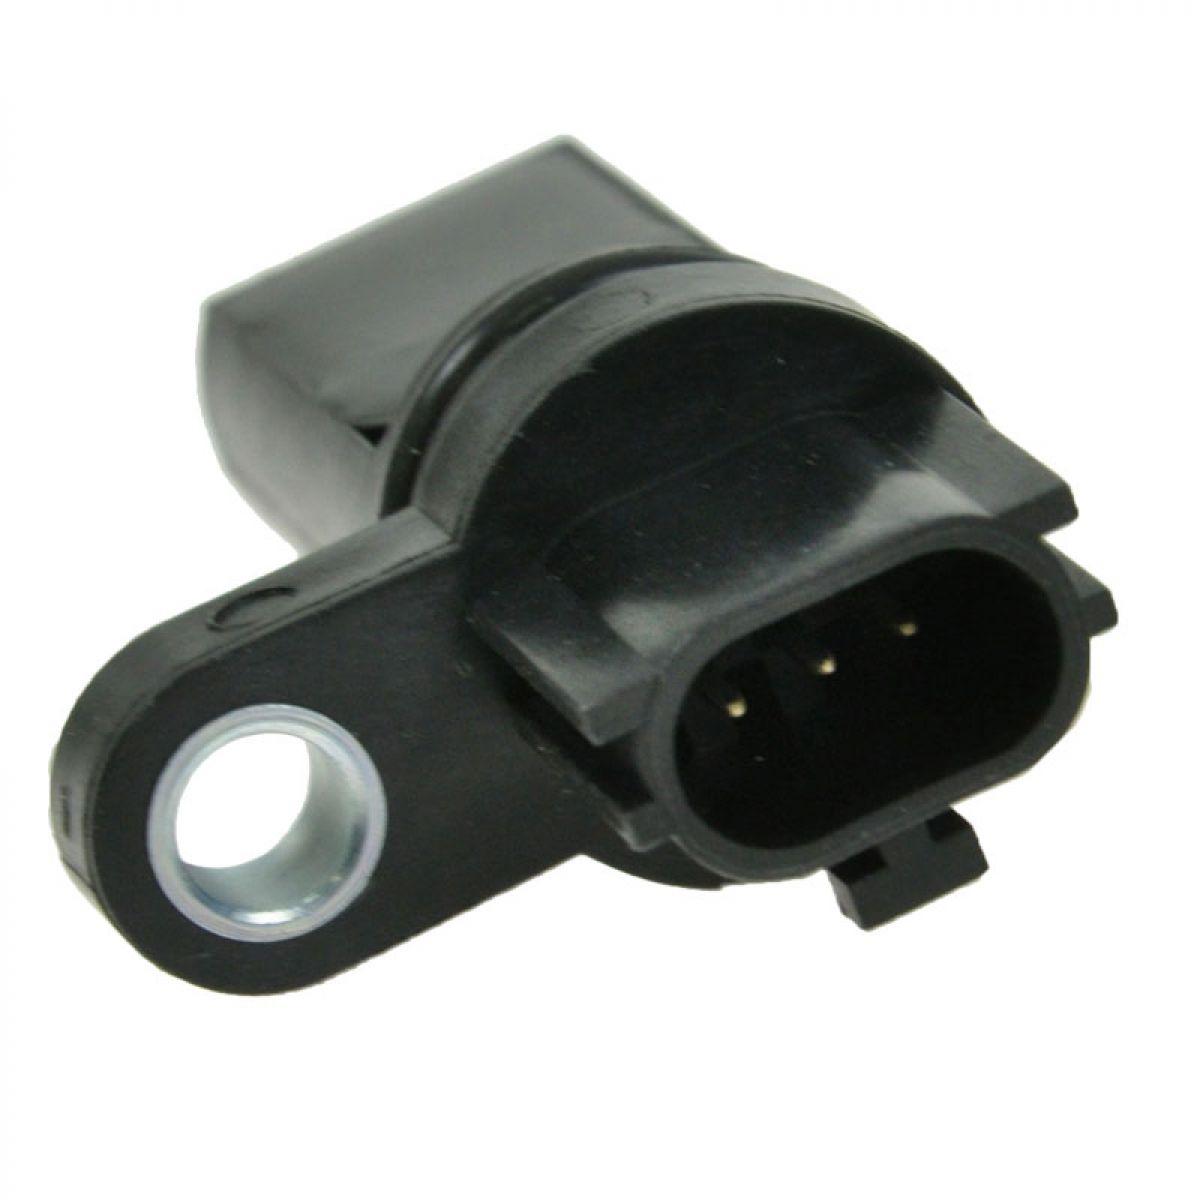 2007 Nissan Maxima Camshaft: Wells SU6516 CAS Camshaft Position Sensor For Nissan